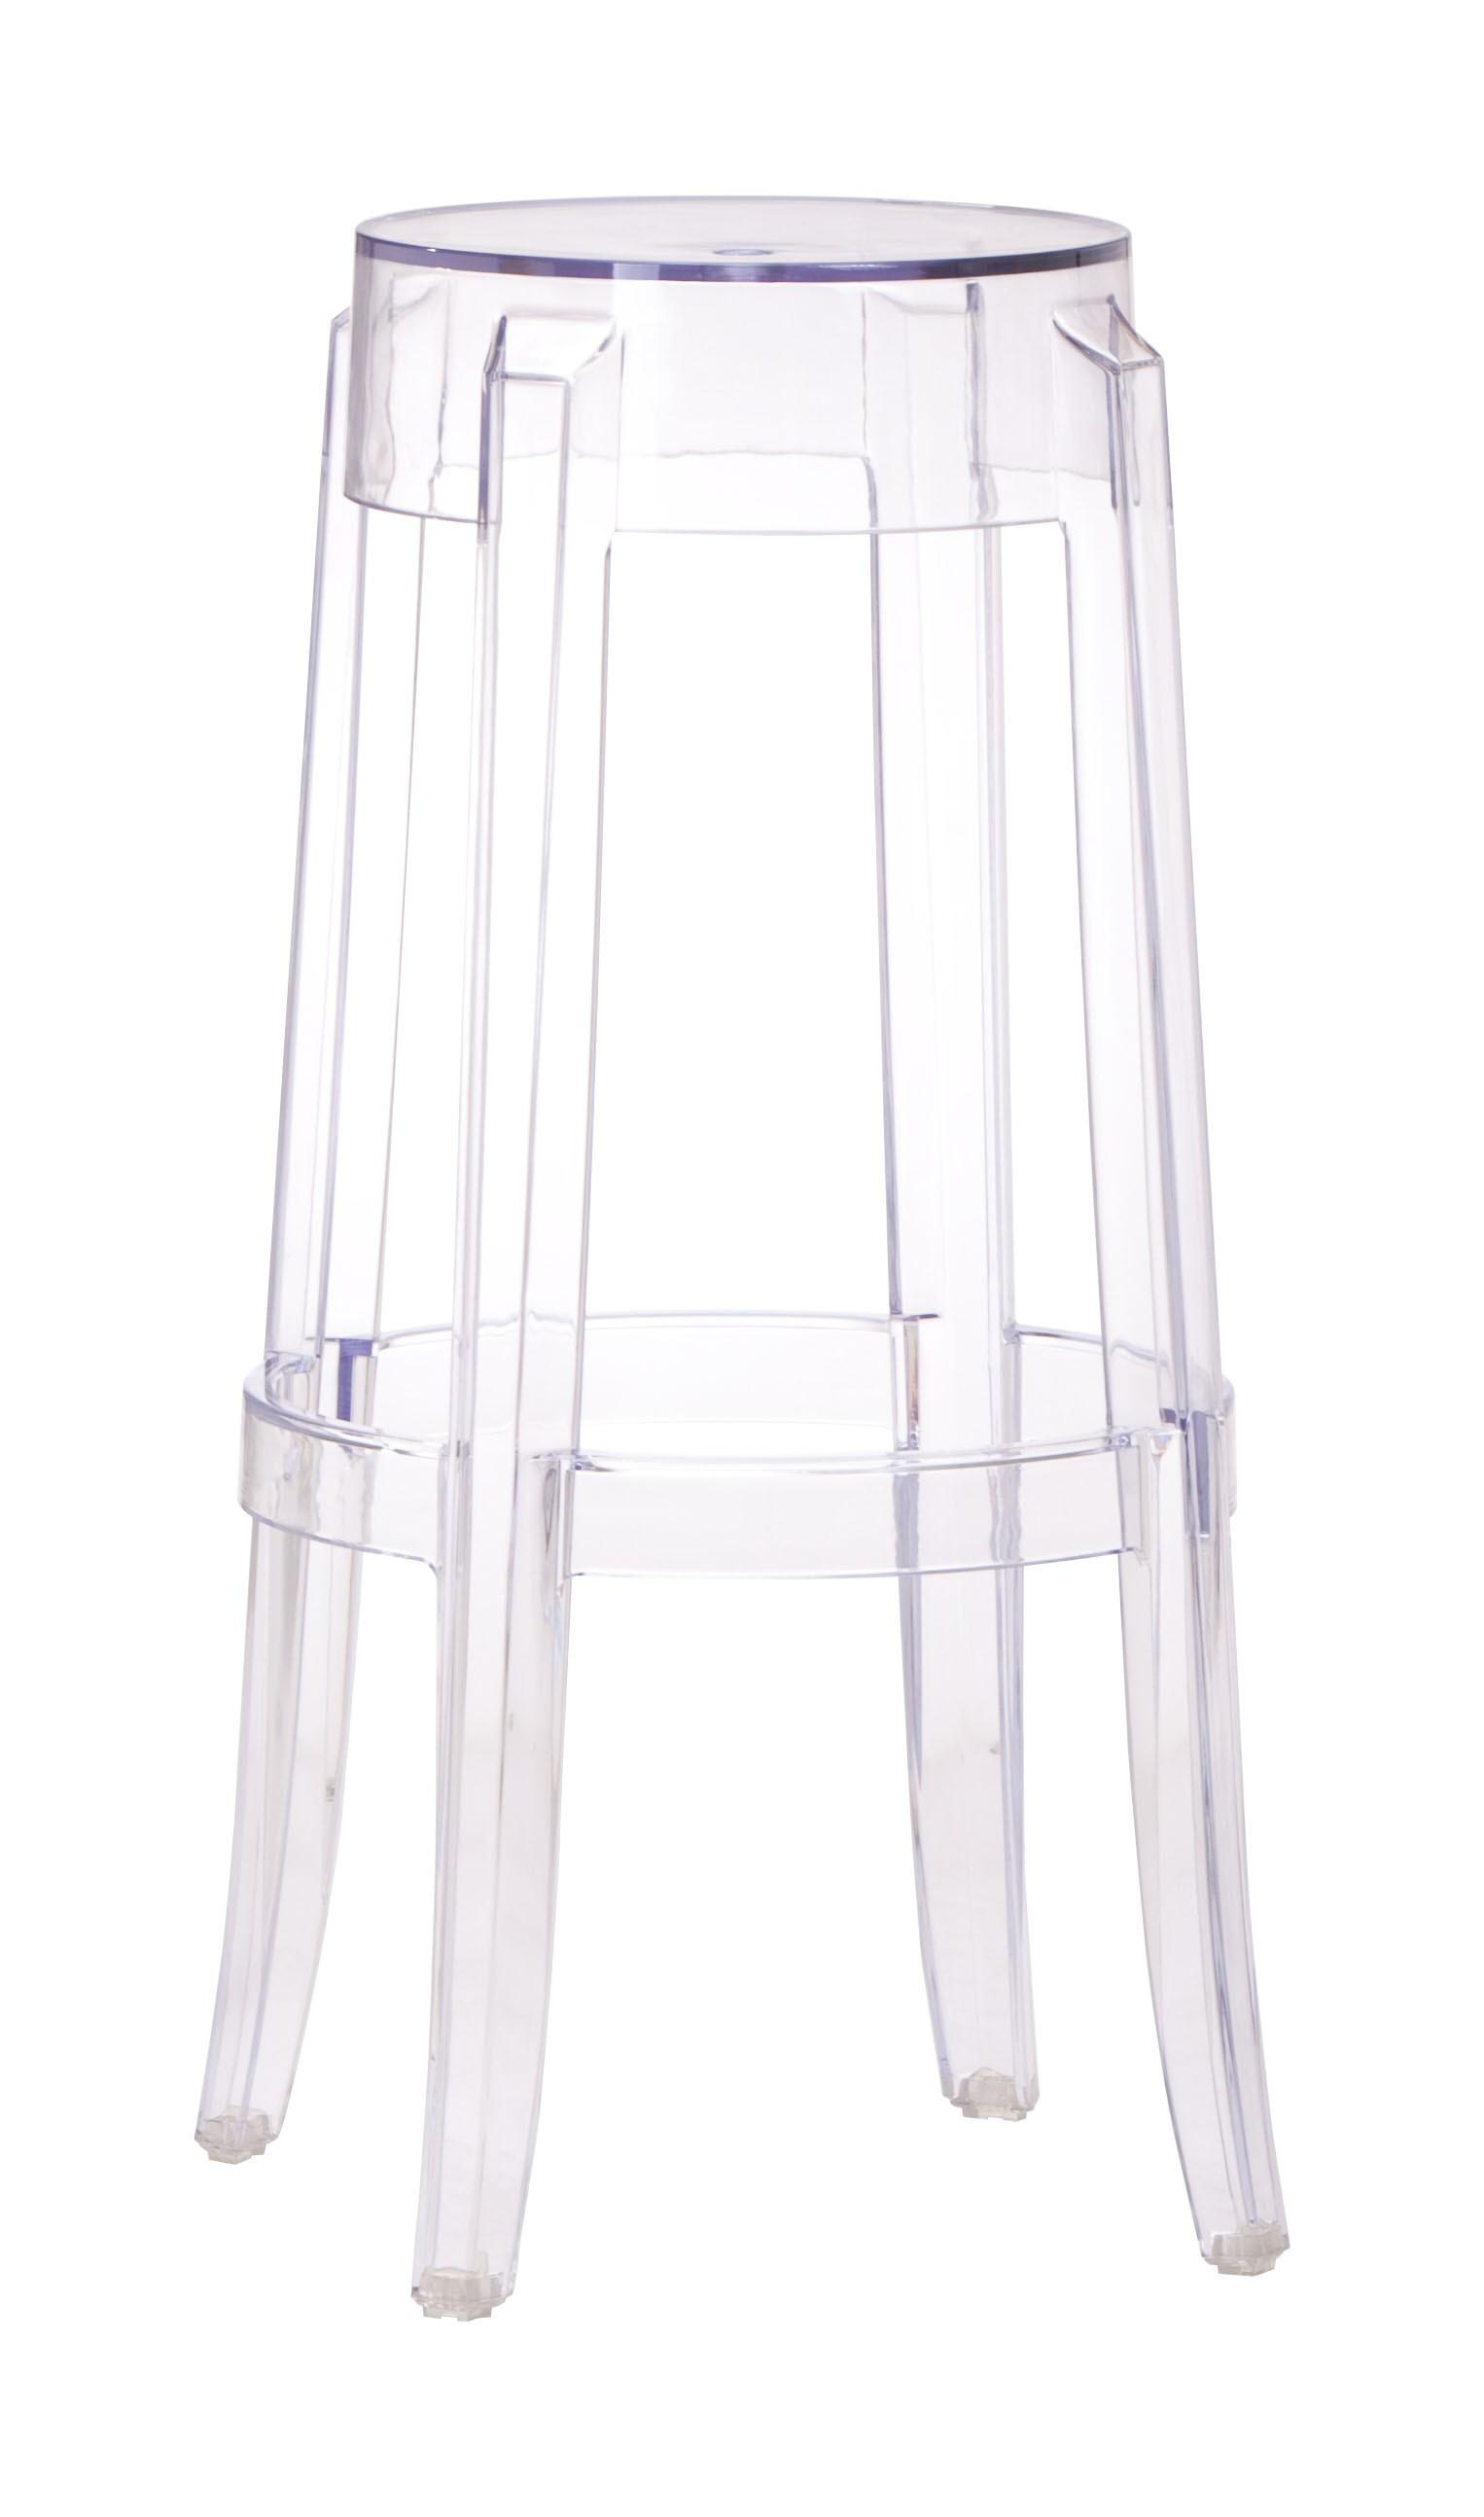 Modern Clear Plastic Barstool